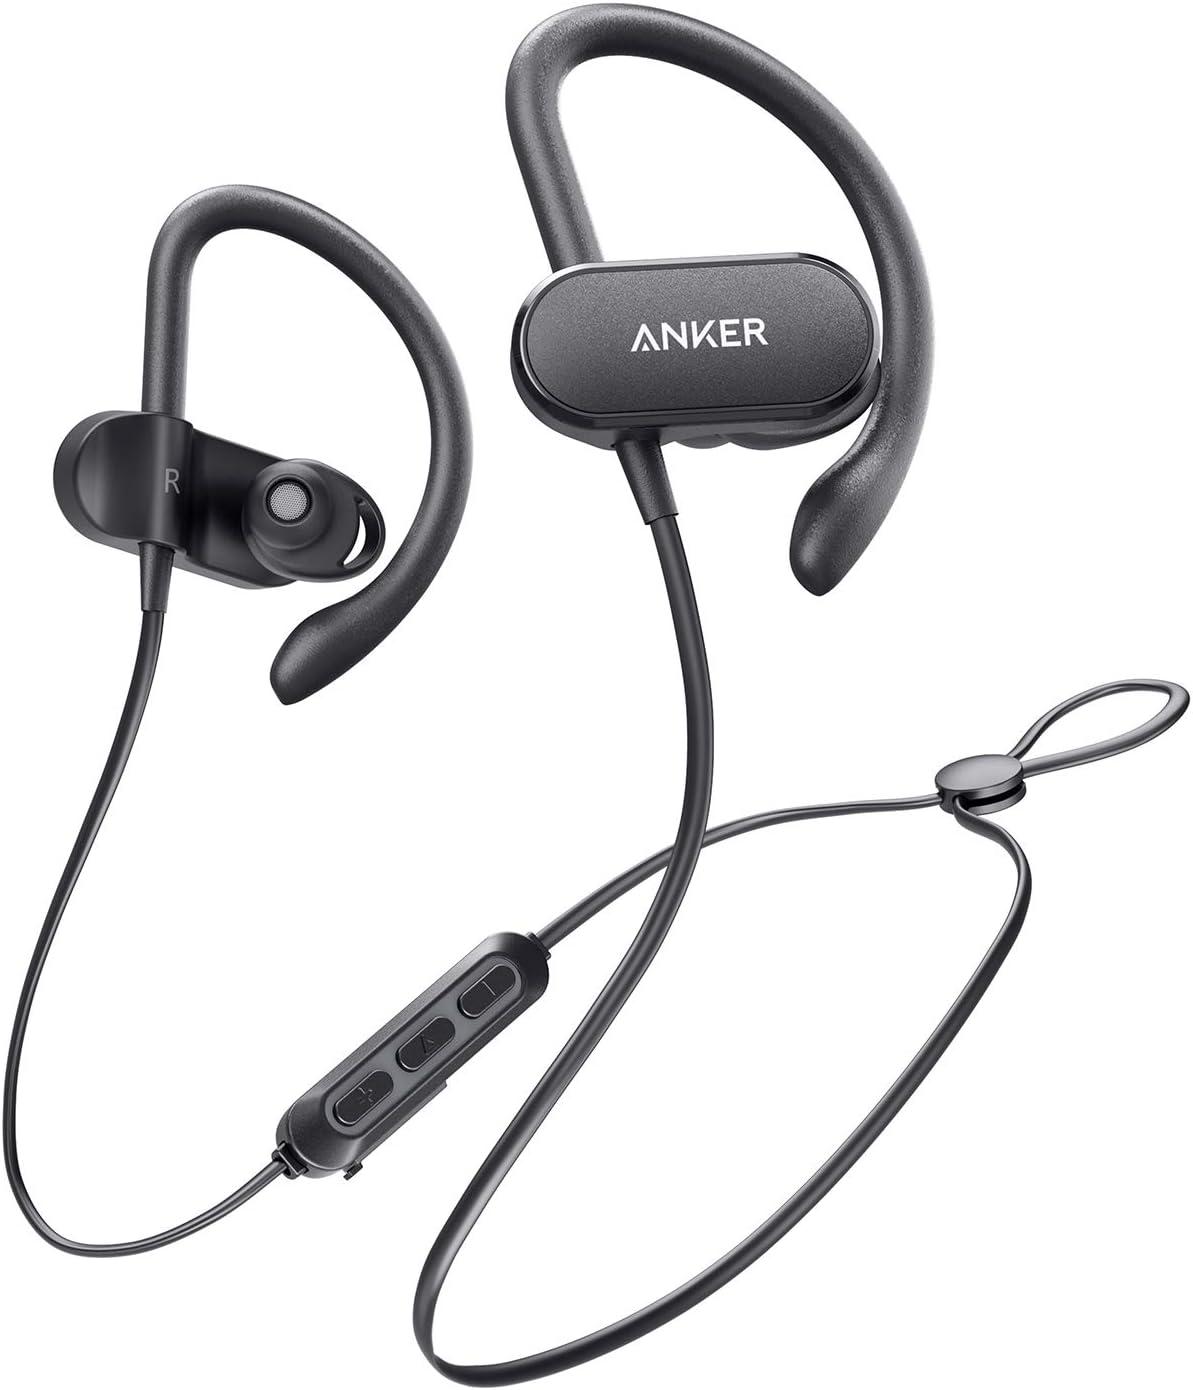 Anker SoundBuds Curve - Auriculares Bluetooth inalámbricos, con Bluetooth 5.0, 18 Horas de duración de la batería, Aislamiento de Ruido CVC, Clase IPX7, Auriculares Deporte